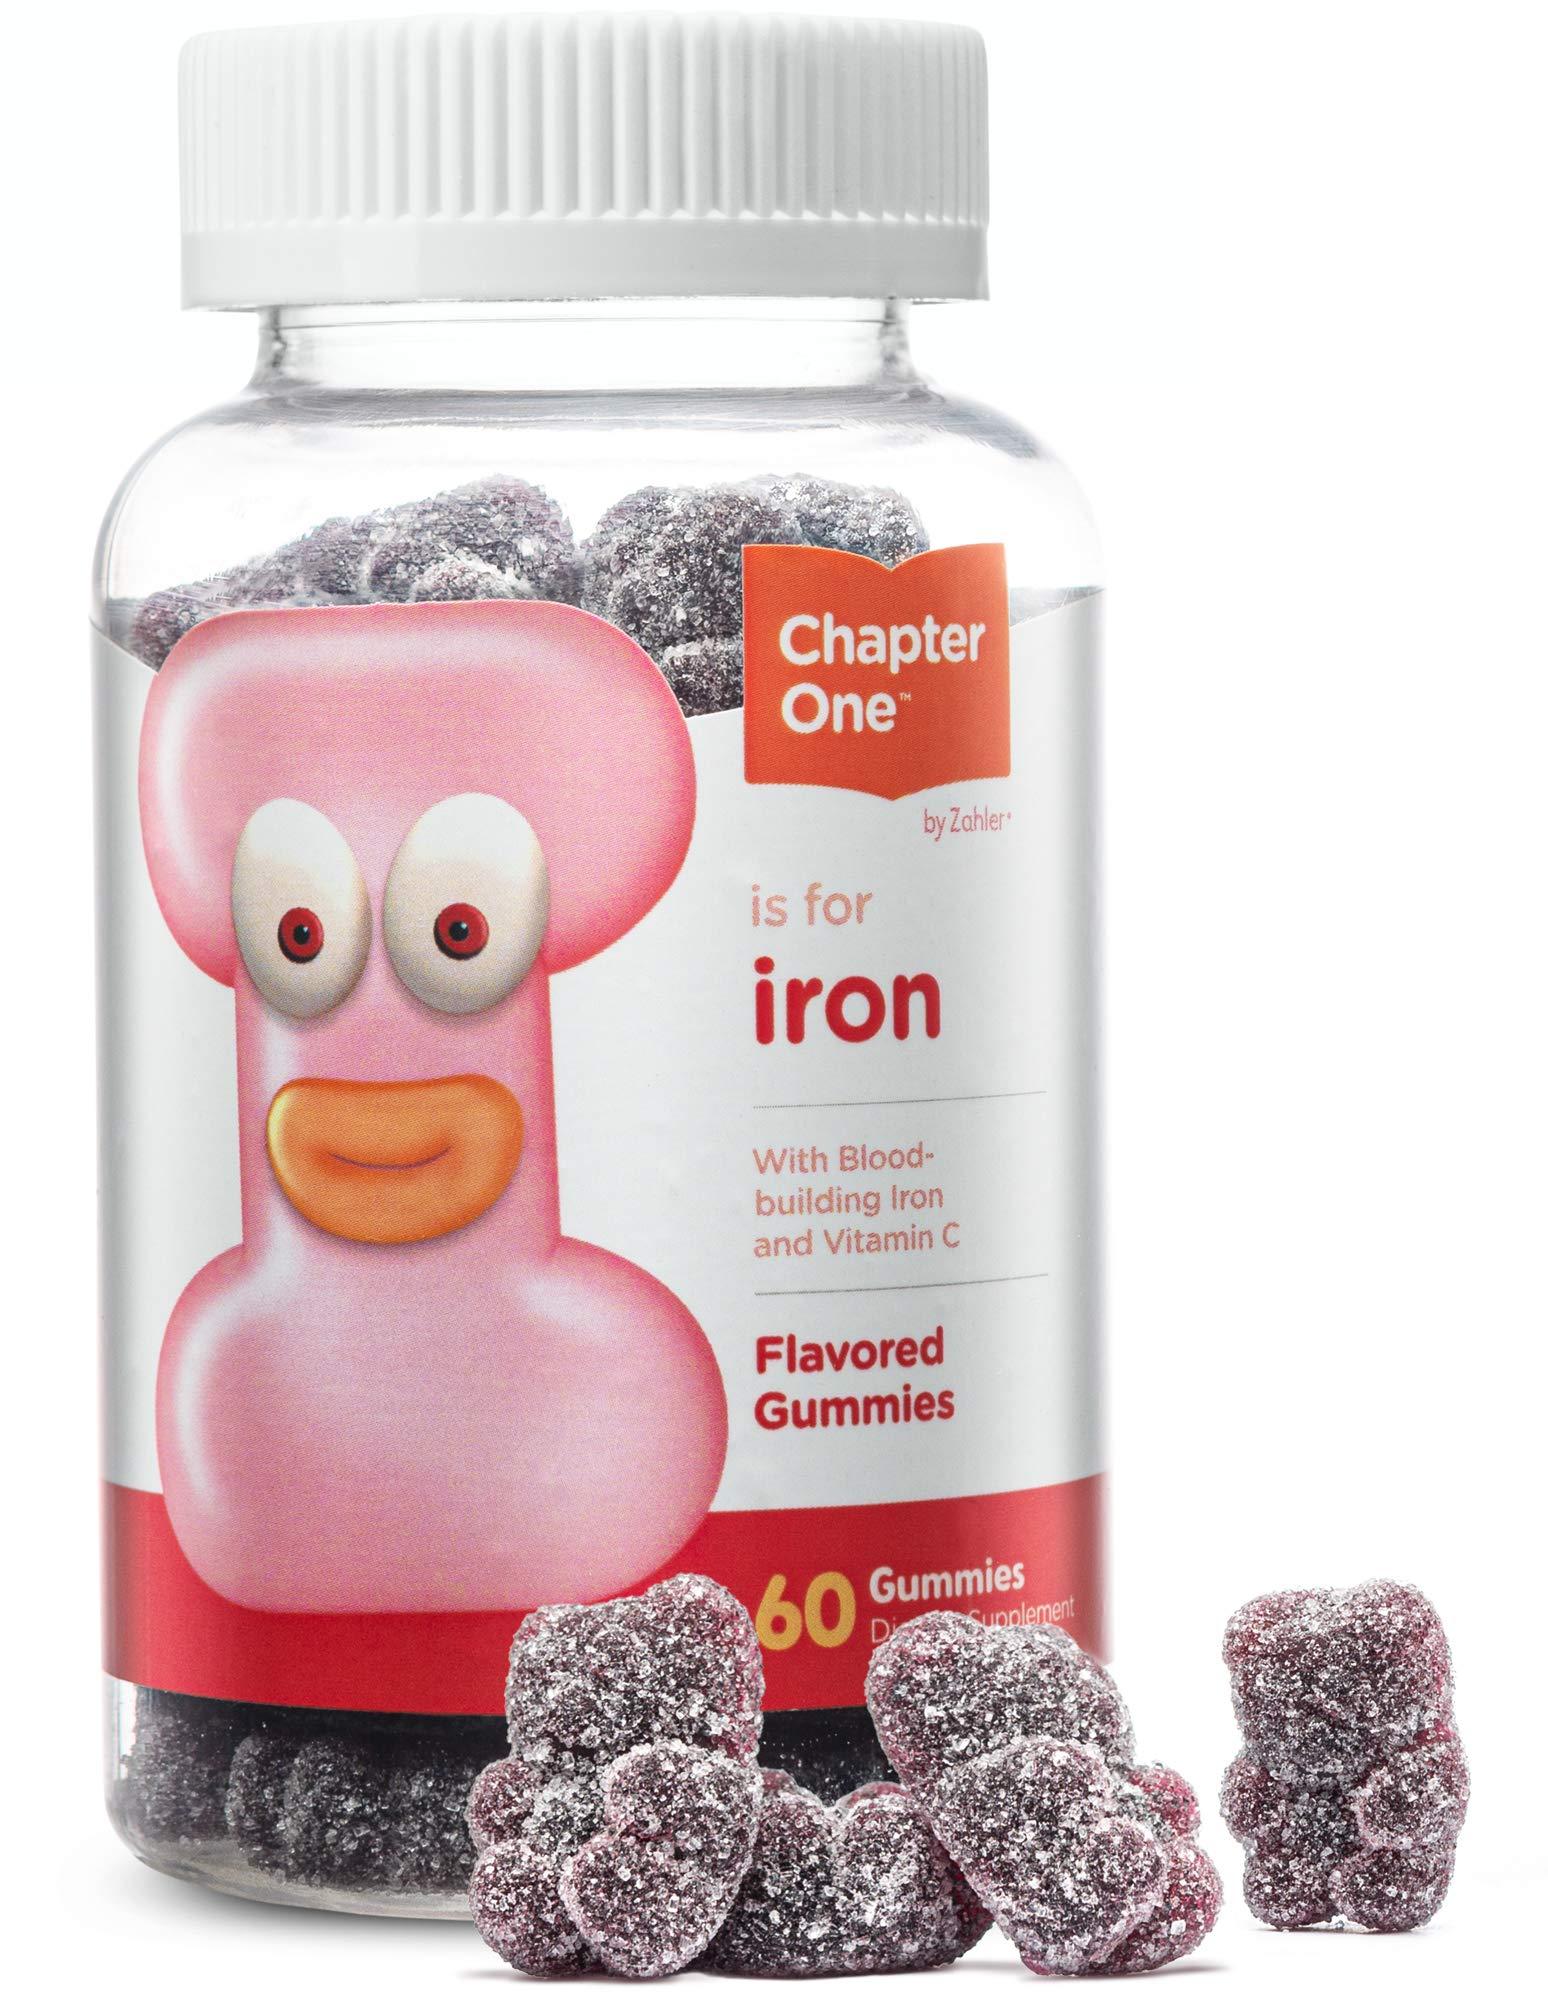 Chapter One Iron Gummies, Great Tasting Iron Gummy Vitamins with Vitamin C, Certified Kosher, 60 Flavored Gummies